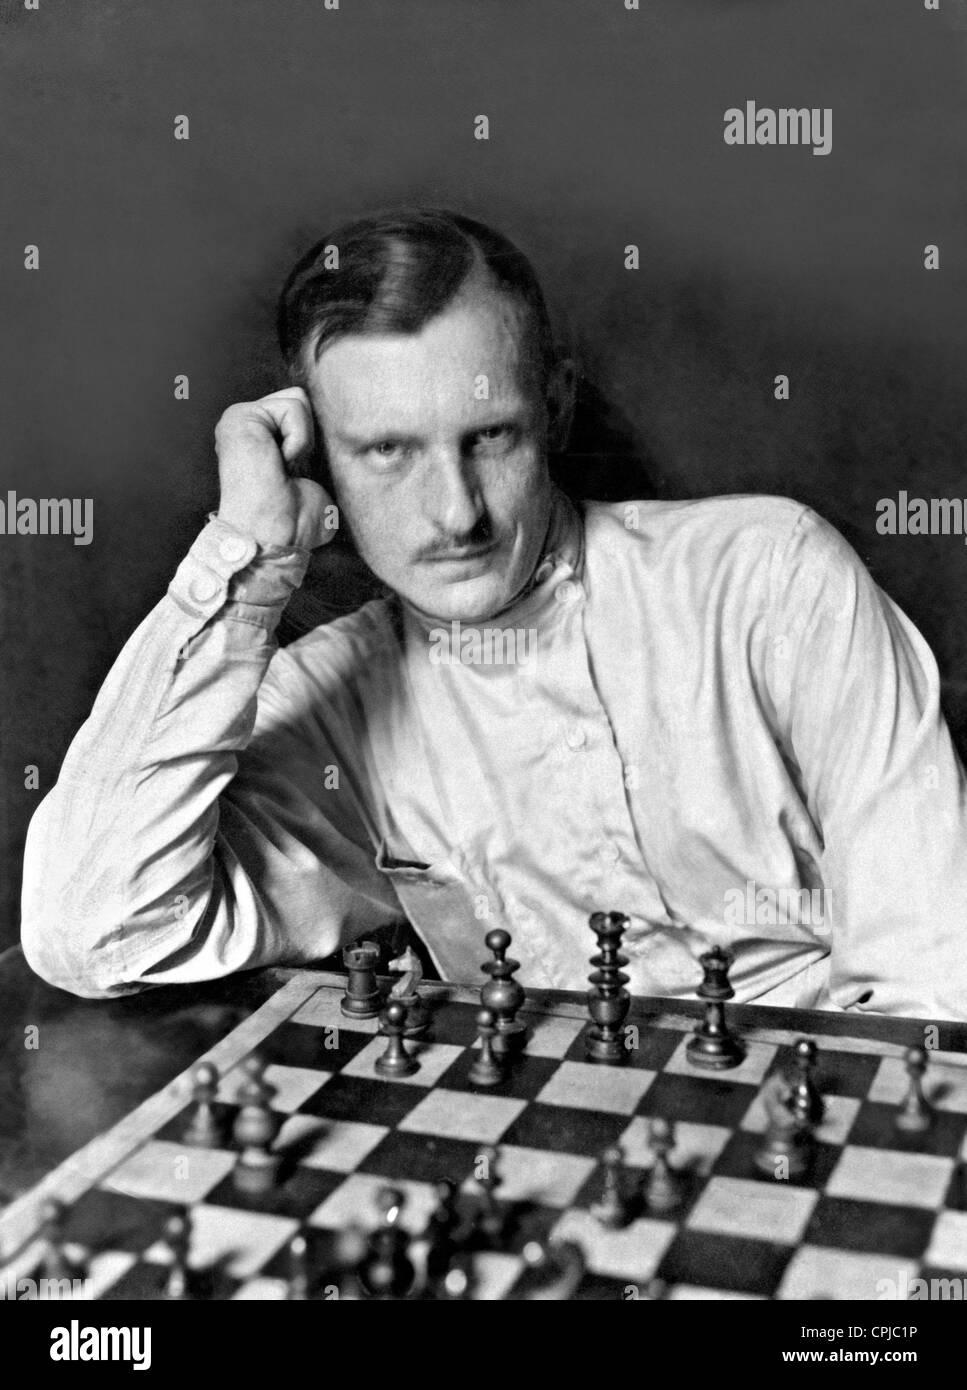 Alexander Alekhine, 1921 Stock Photo: 48347762 - Alamy